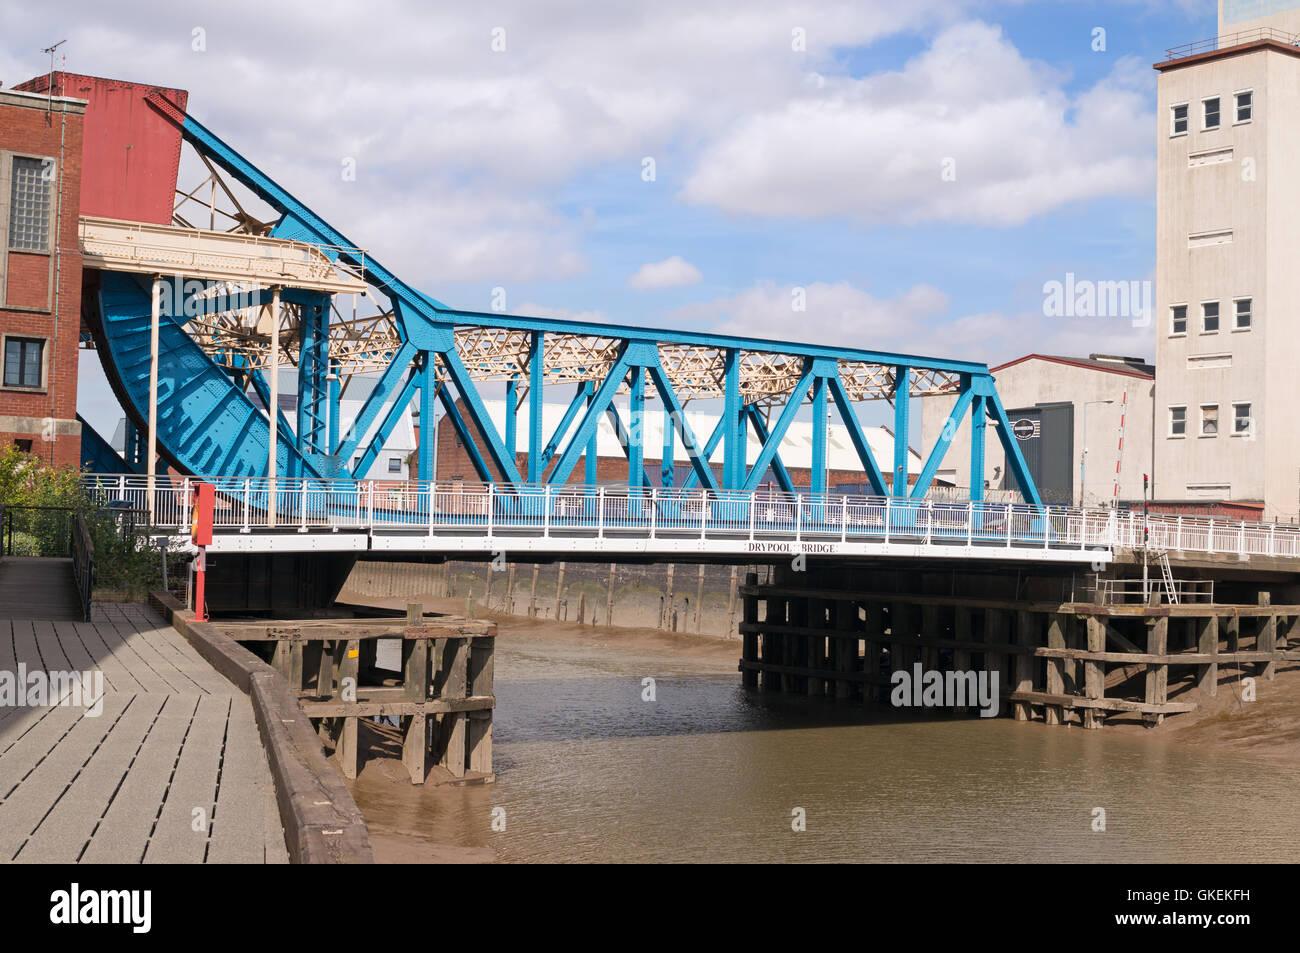 Scherzer rolling lift bascule Drypool Bridge, Kingston upon Hull, Yorkshire, England, UK - Stock Image